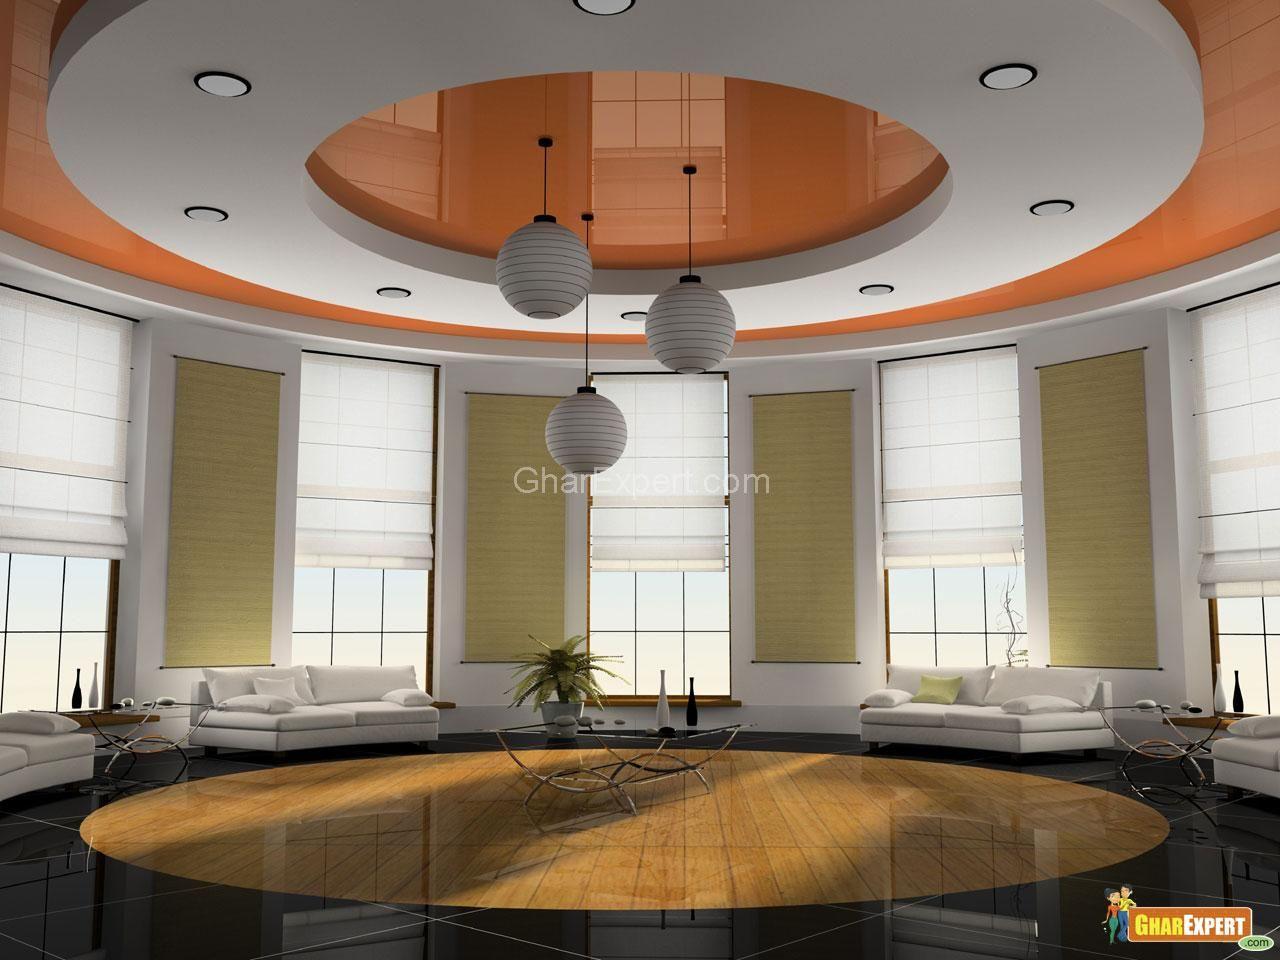 Pop Design Ceiling For Modern Interior, Pop Ceiling Designs, False Ceiling    Ceiling Designs   Pinterest   Pop Ceiling Design, Pop Design And Modern  ...